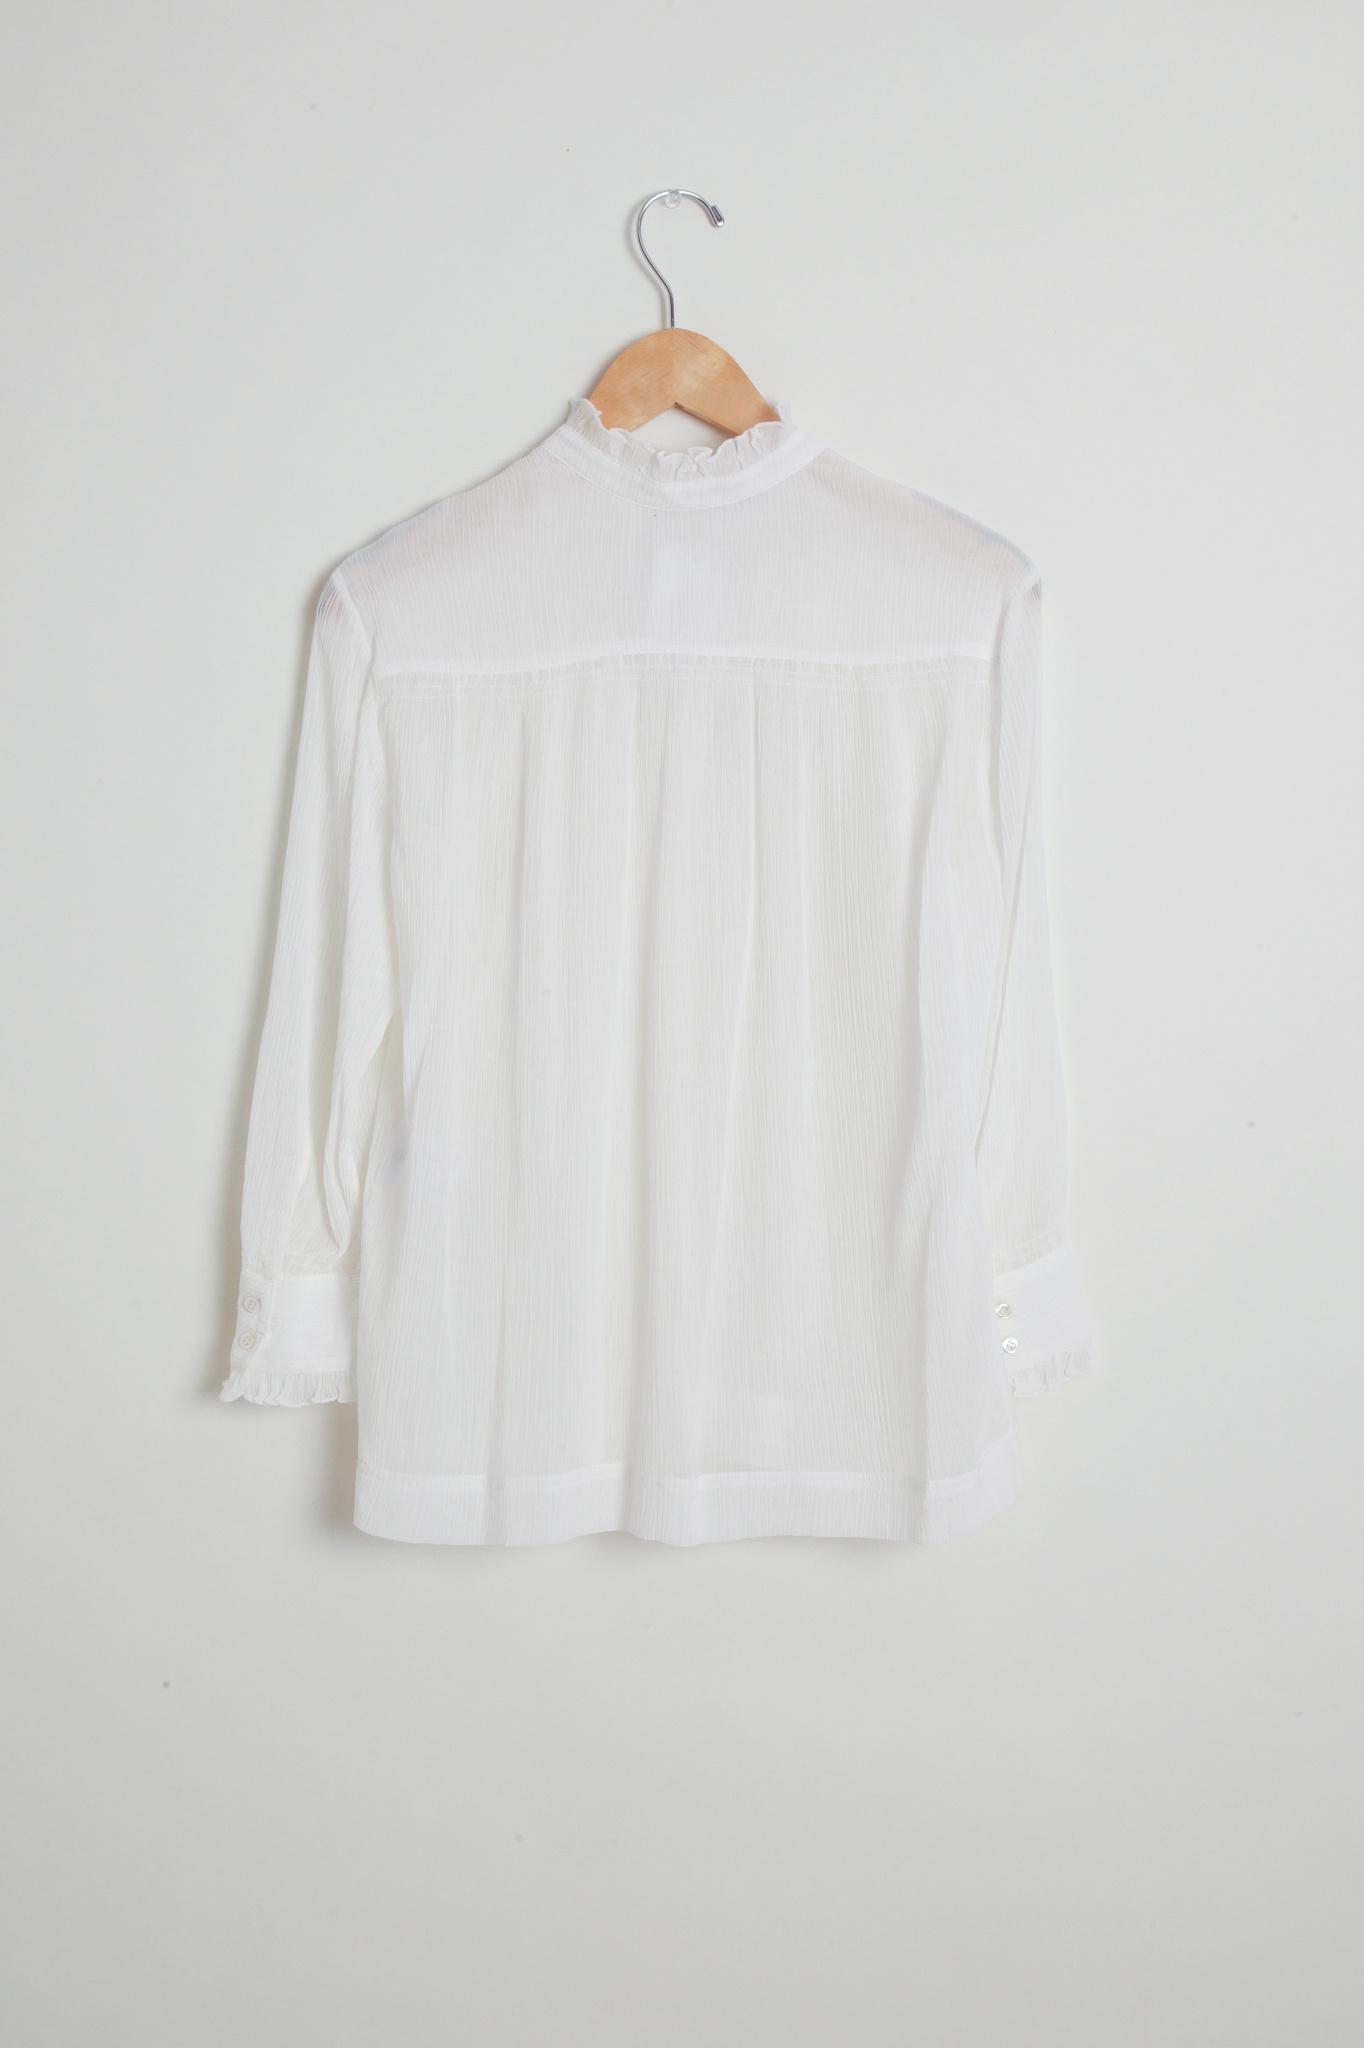 vanessa Bruno Nina Cotton and Silk Blouse - Size 40